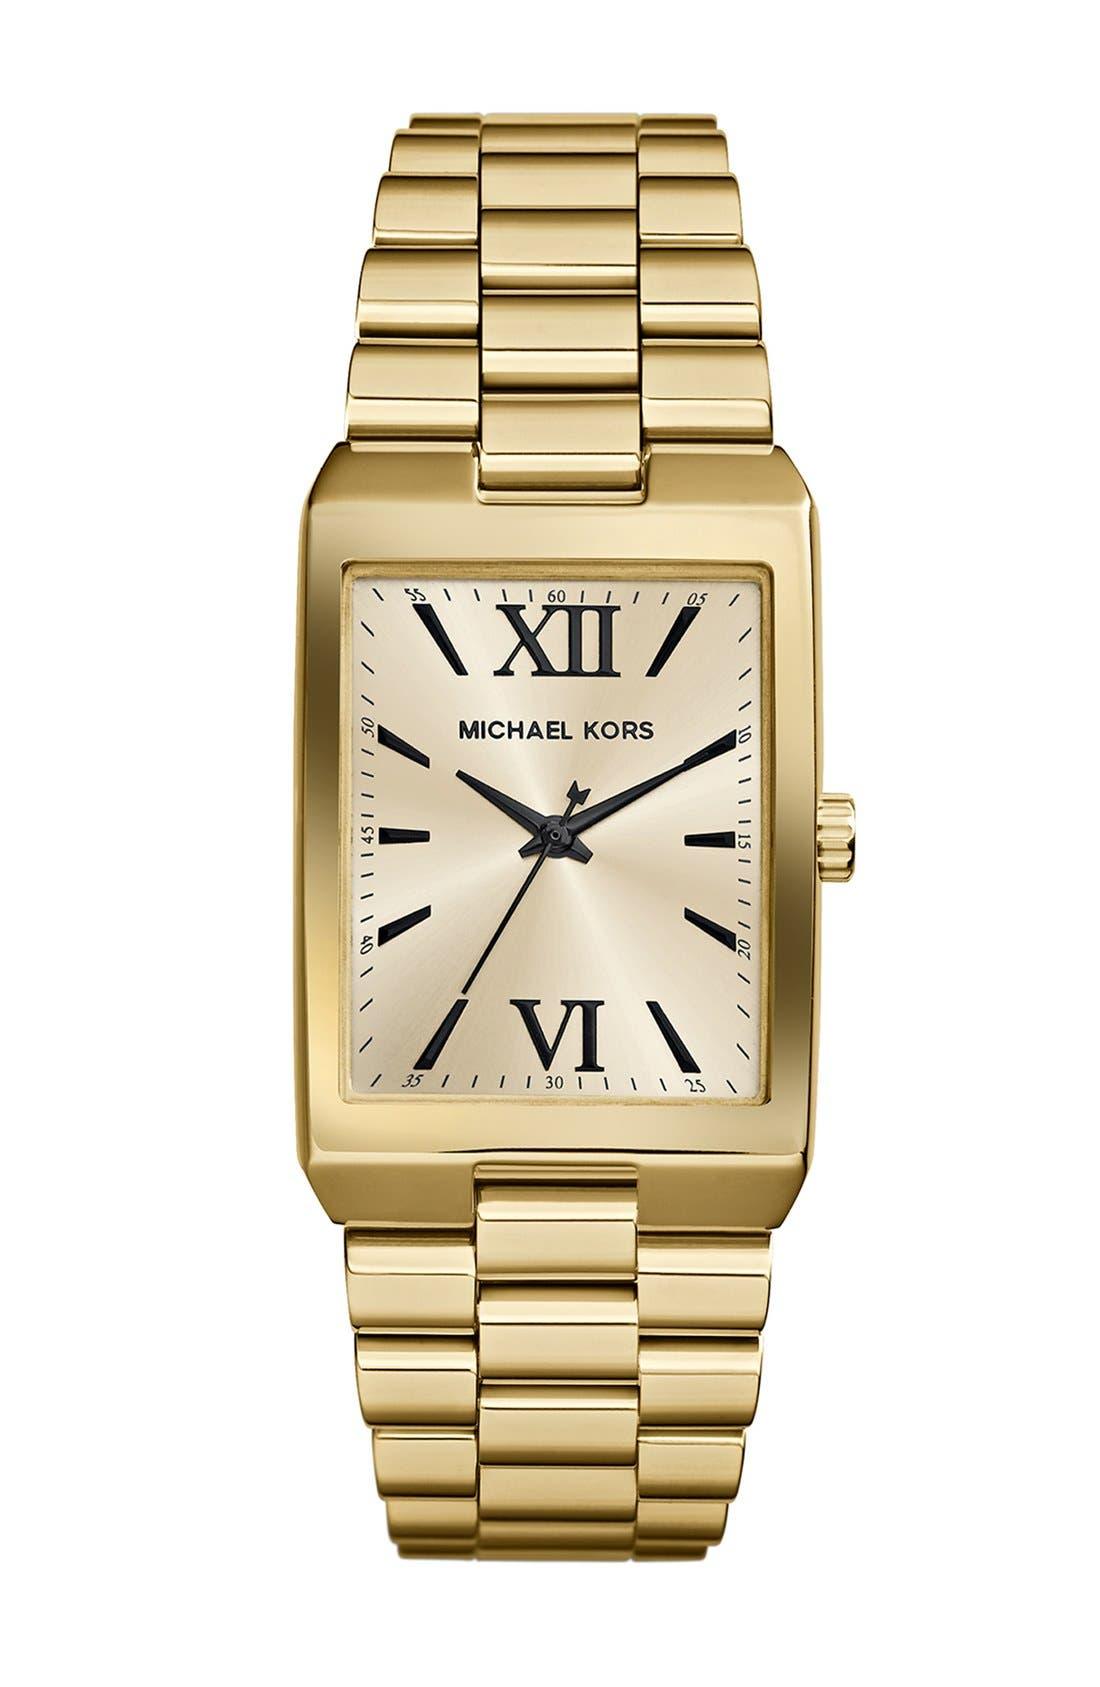 Main Image - Michael Kors 'Nash' Rectangle Bracelet Watch, 34mm